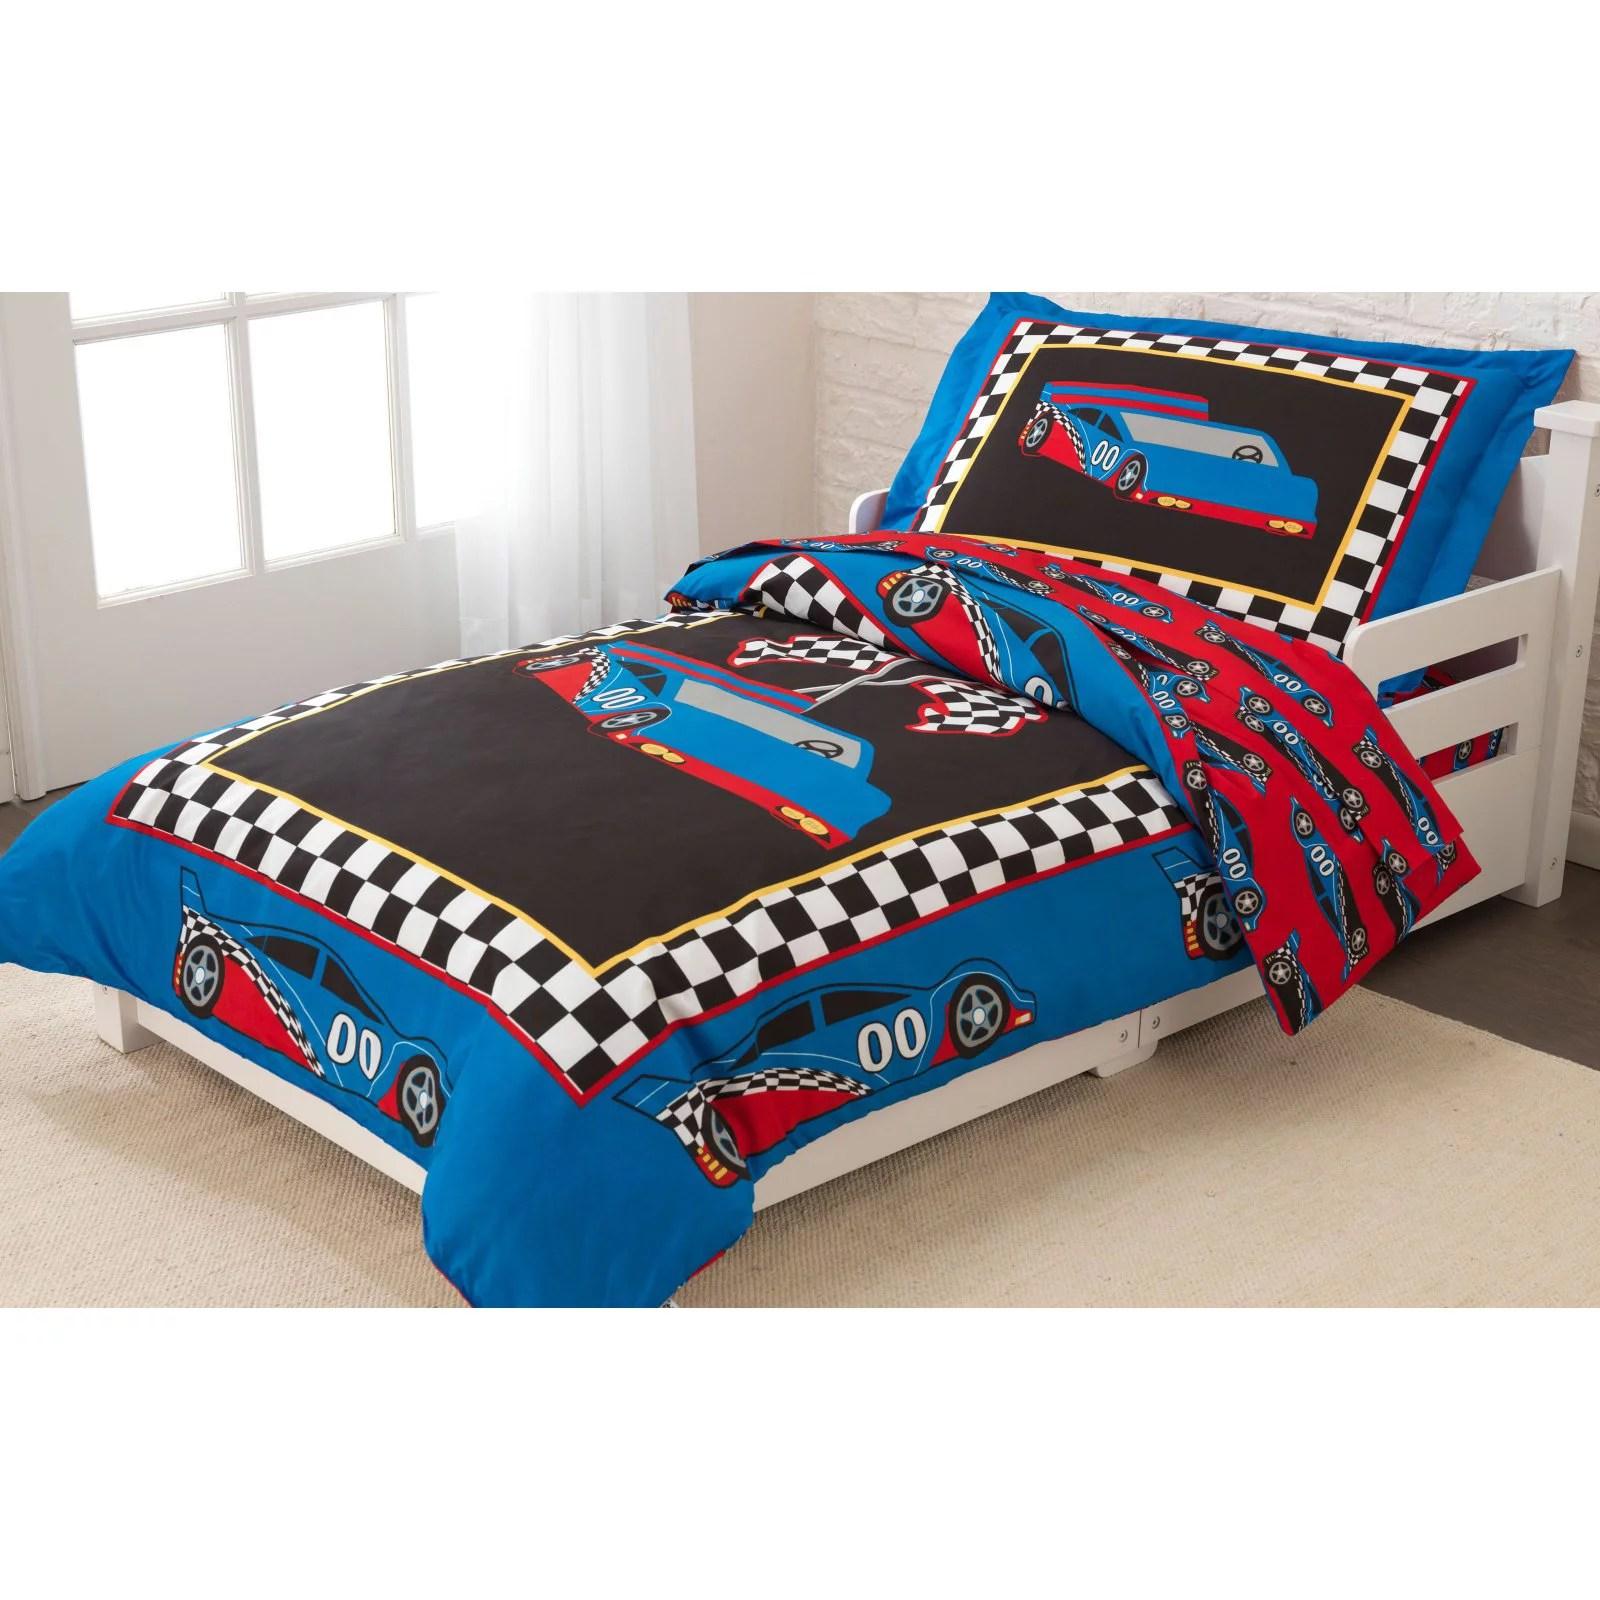 racecar toddler bedding 4 pc set walmart com